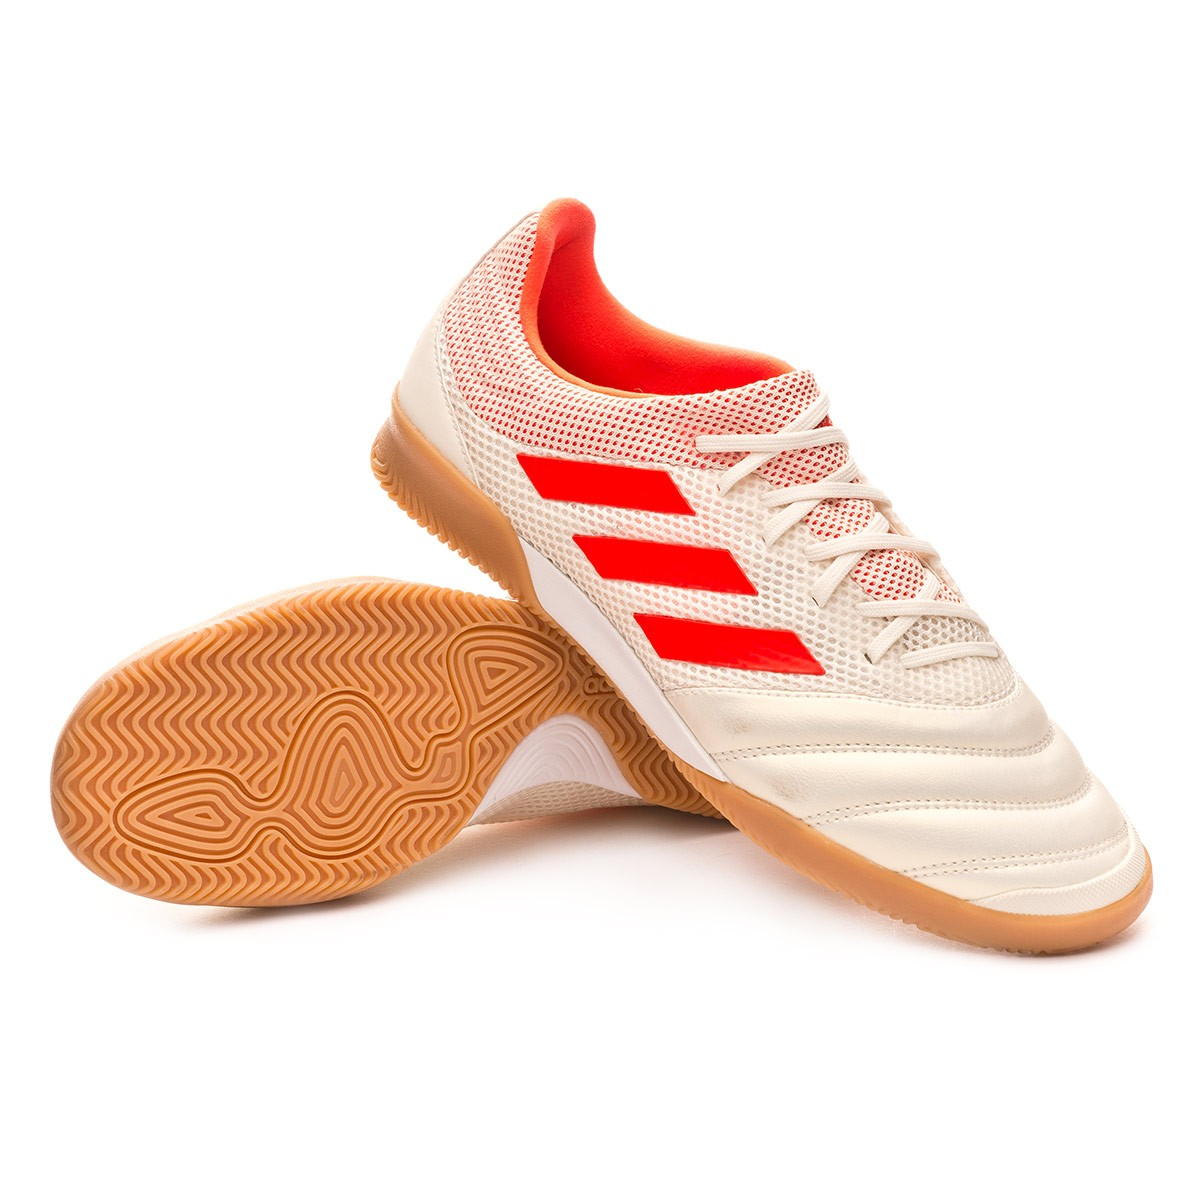 Chaussure de futsal adidas Copa Tango 19.3 IN Sala